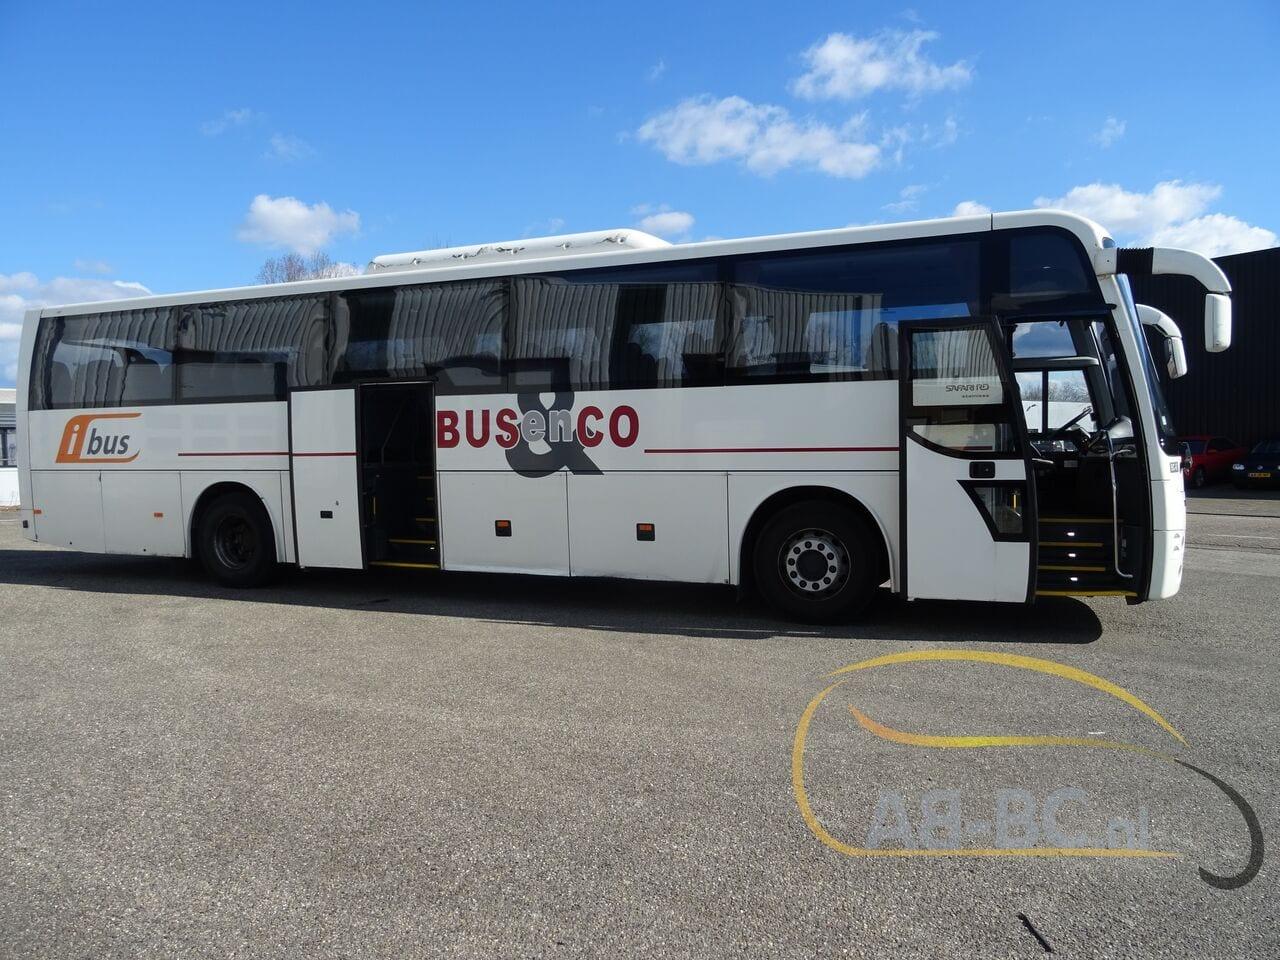 coach-busTEMSA-Safari-RD-53-Seats-DAF-Motor-12-mtr---1616166562446246375_big_6fd62afb5df3e7021826d1703b723482--21031917053743807500